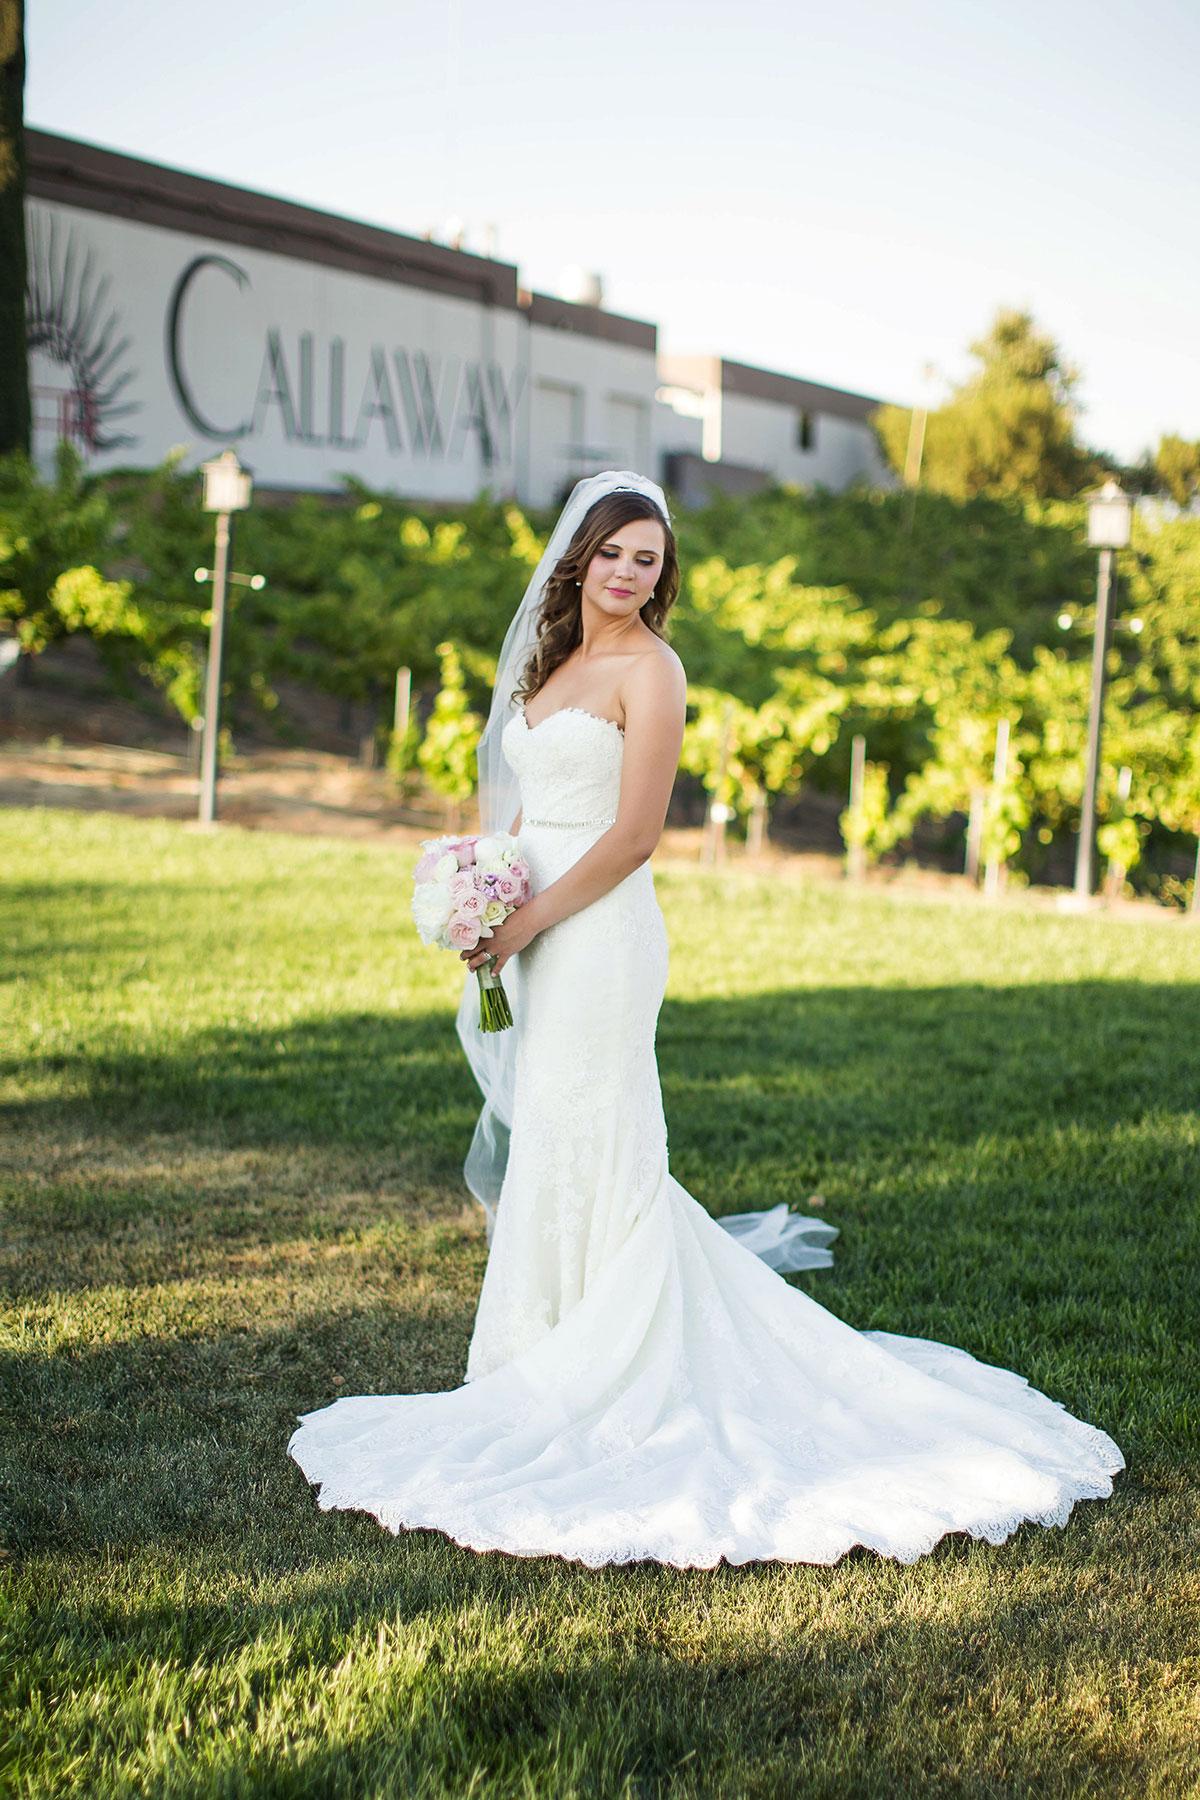 Callaway Winery Wedding   Temecula